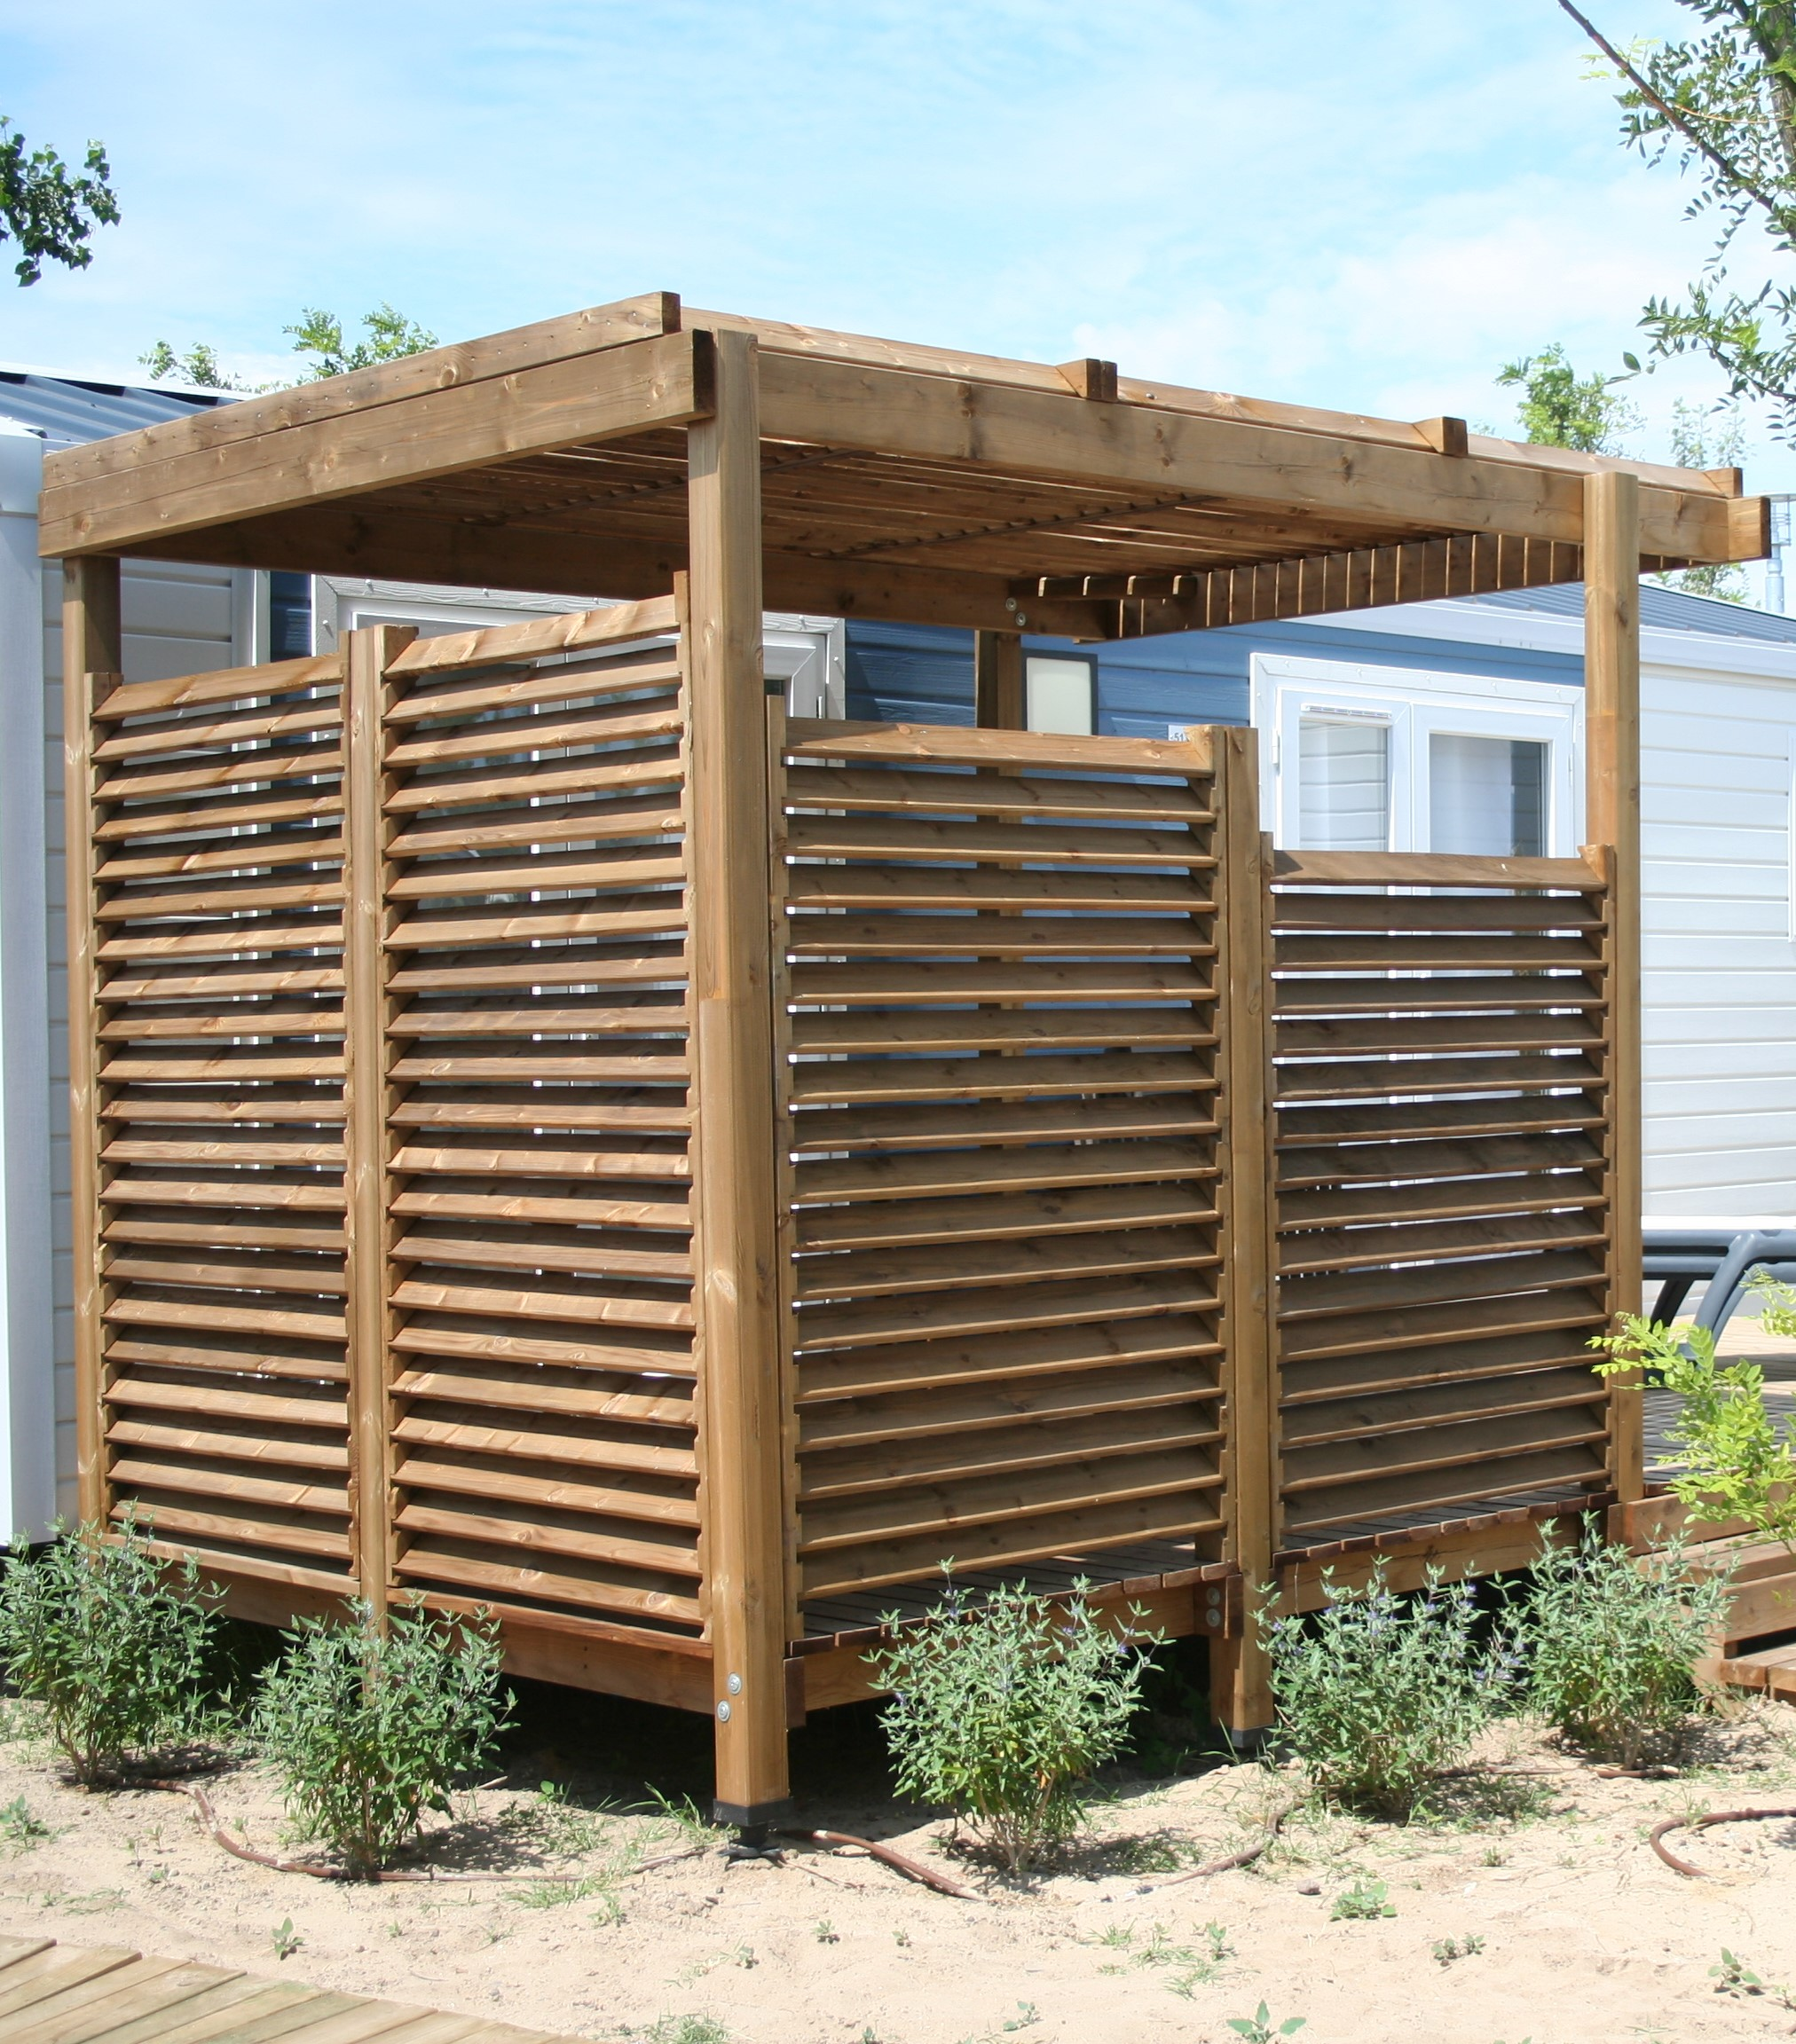 terrasses mobil home christophe roux. Black Bedroom Furniture Sets. Home Design Ideas